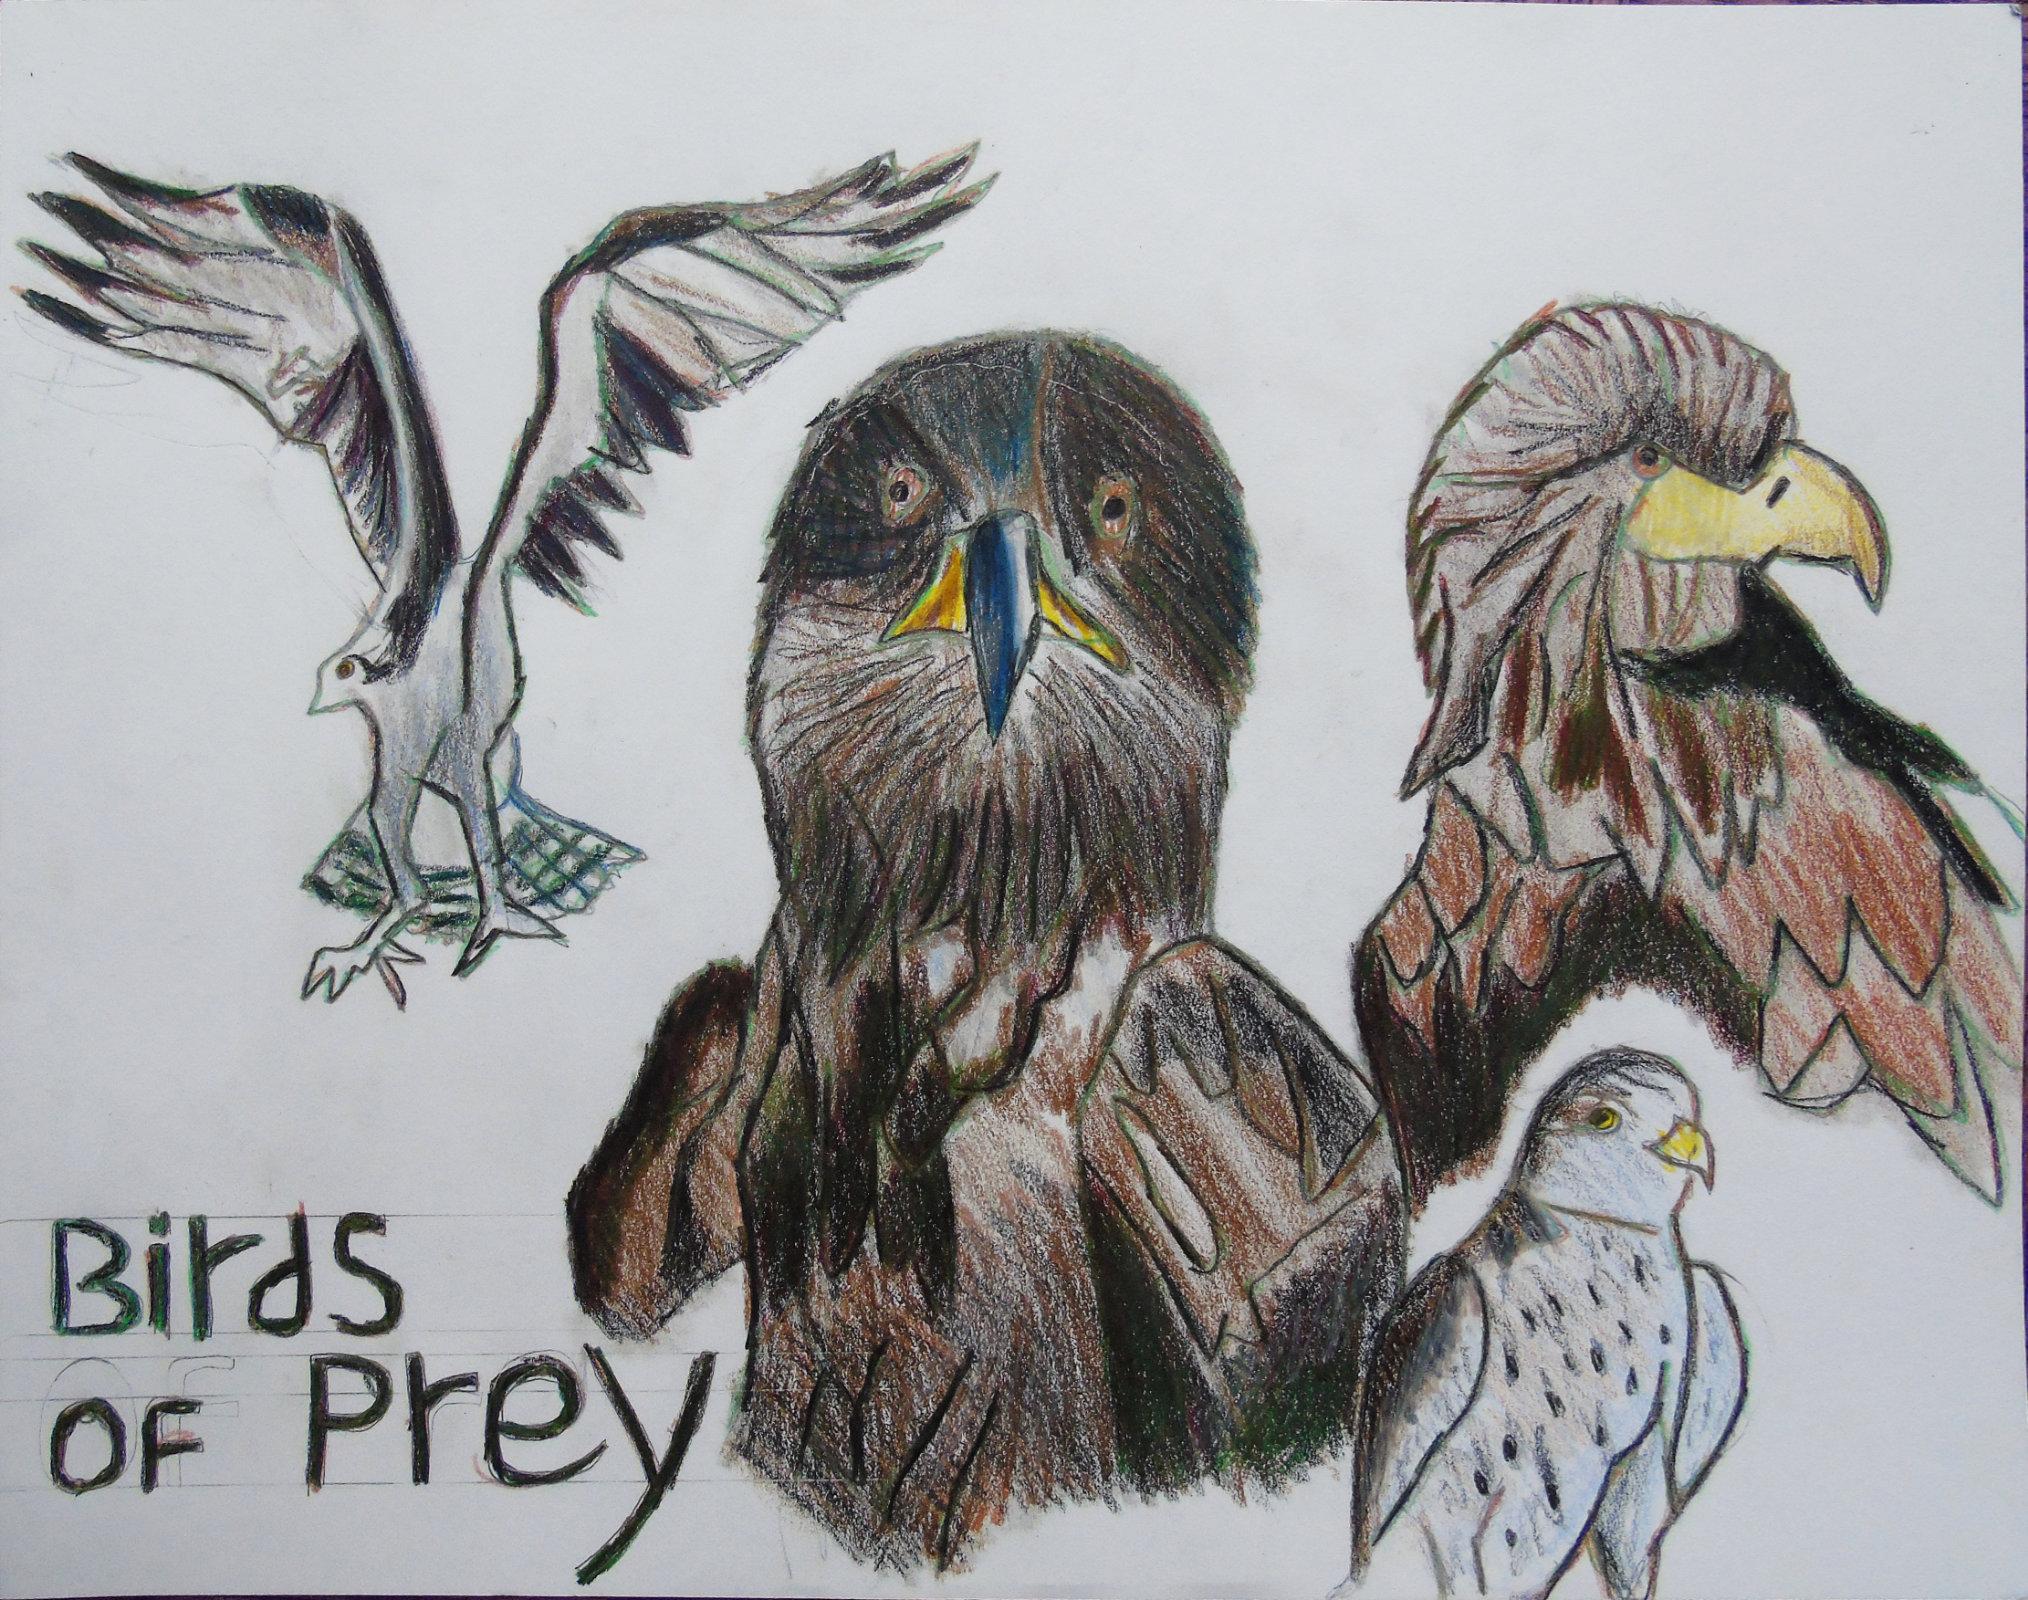 Birds of prey colouredpencils